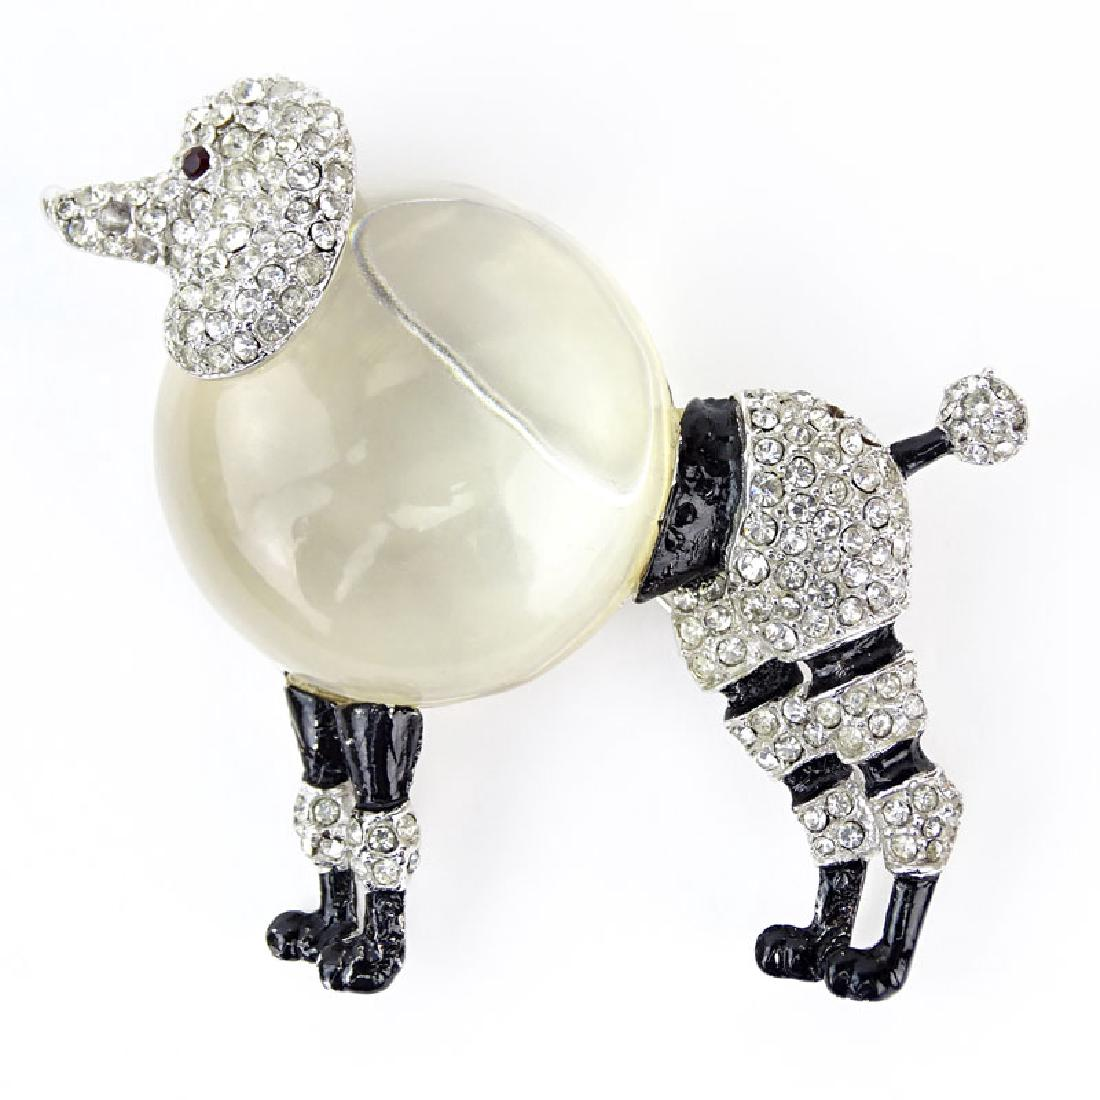 Rhinestone poodle brooch